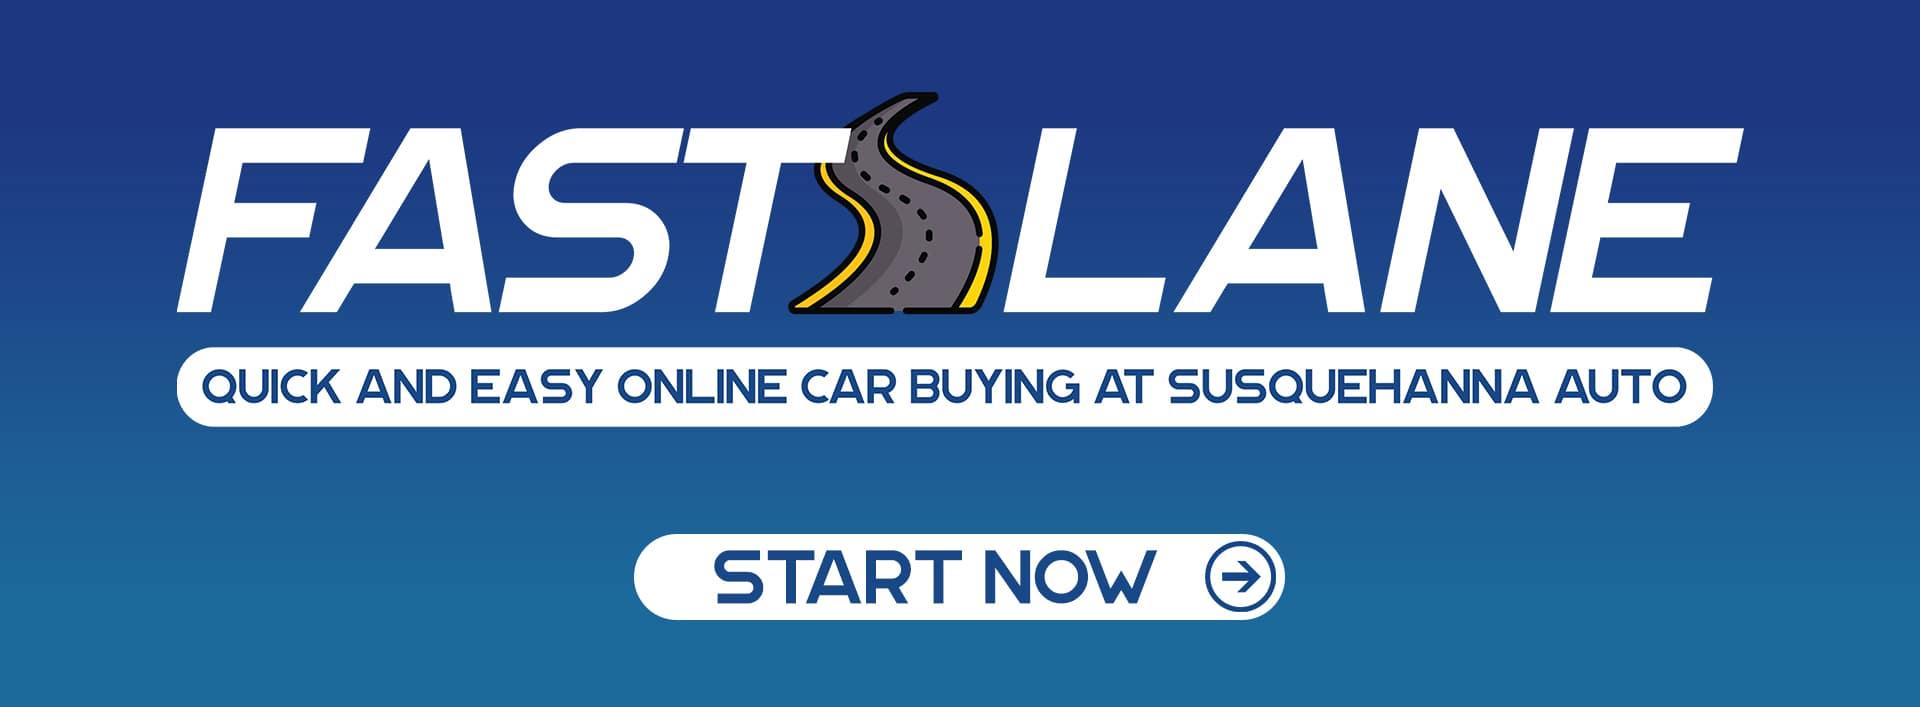 Fast-Lane-Slider-CDJR-04-19-2021